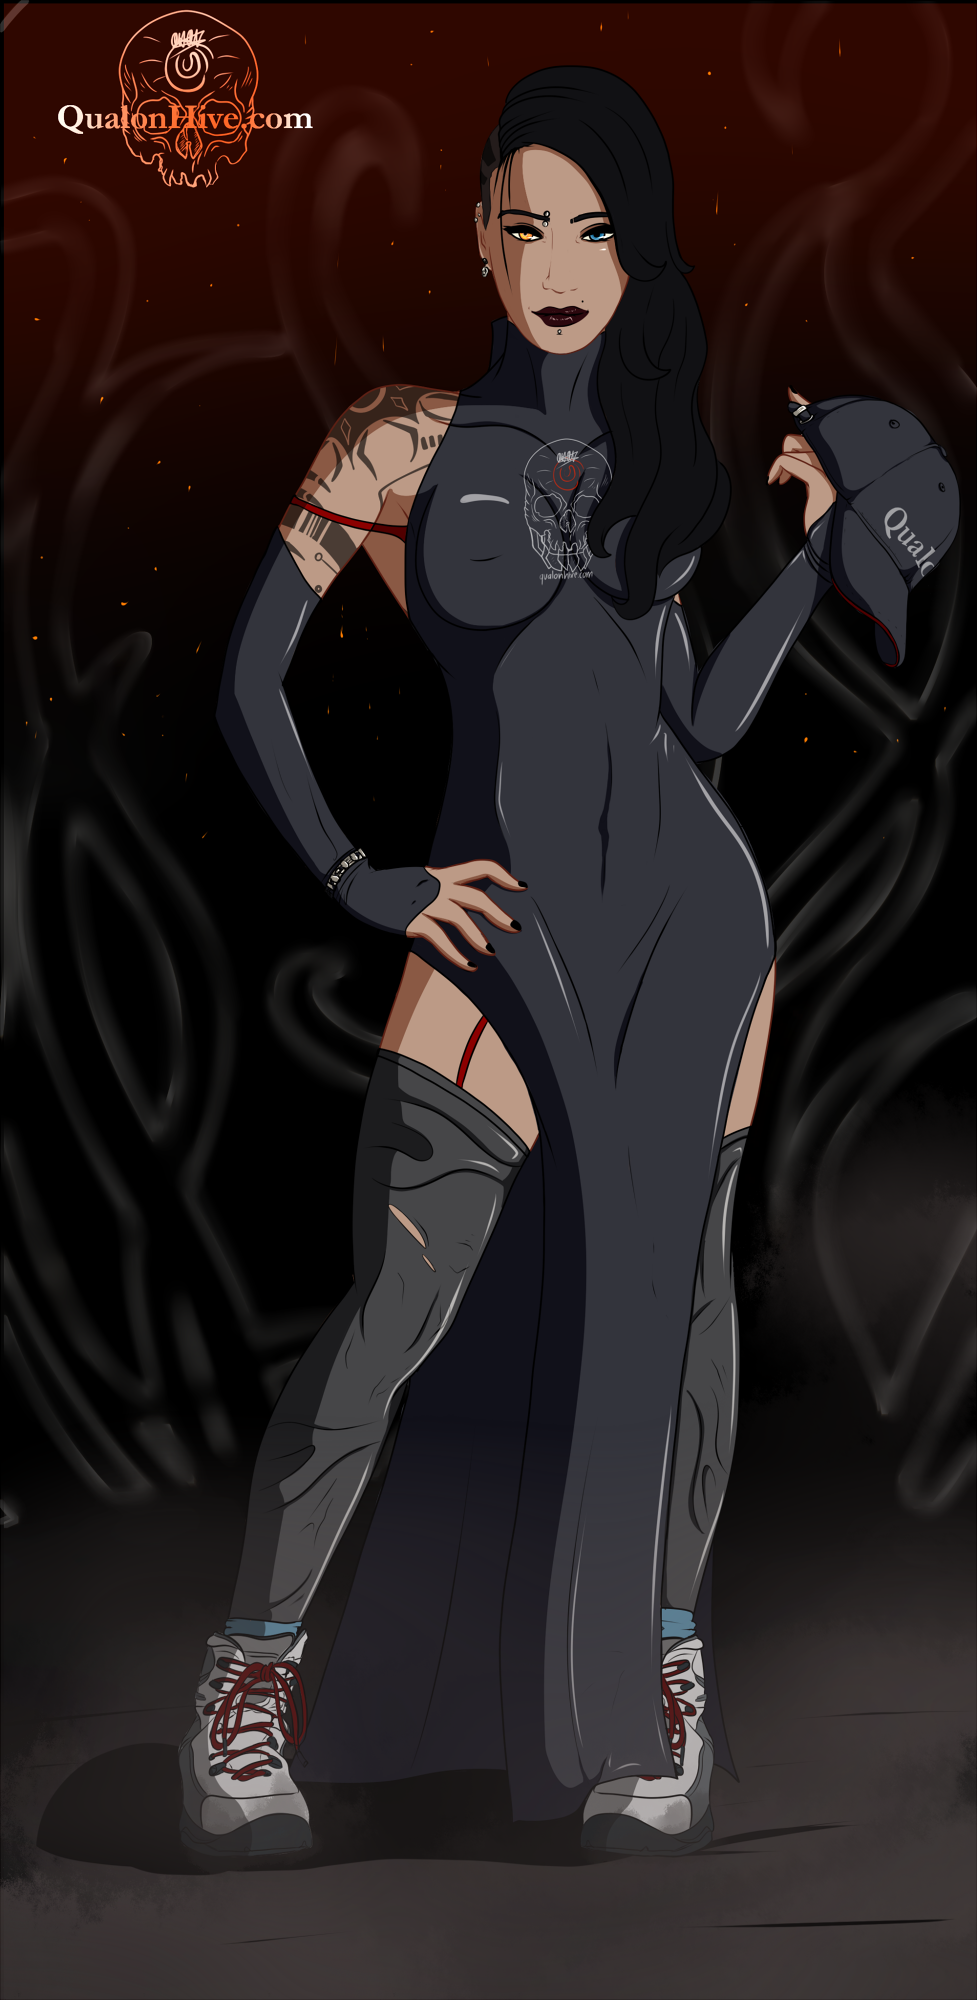 Myra : QualonHive Dress